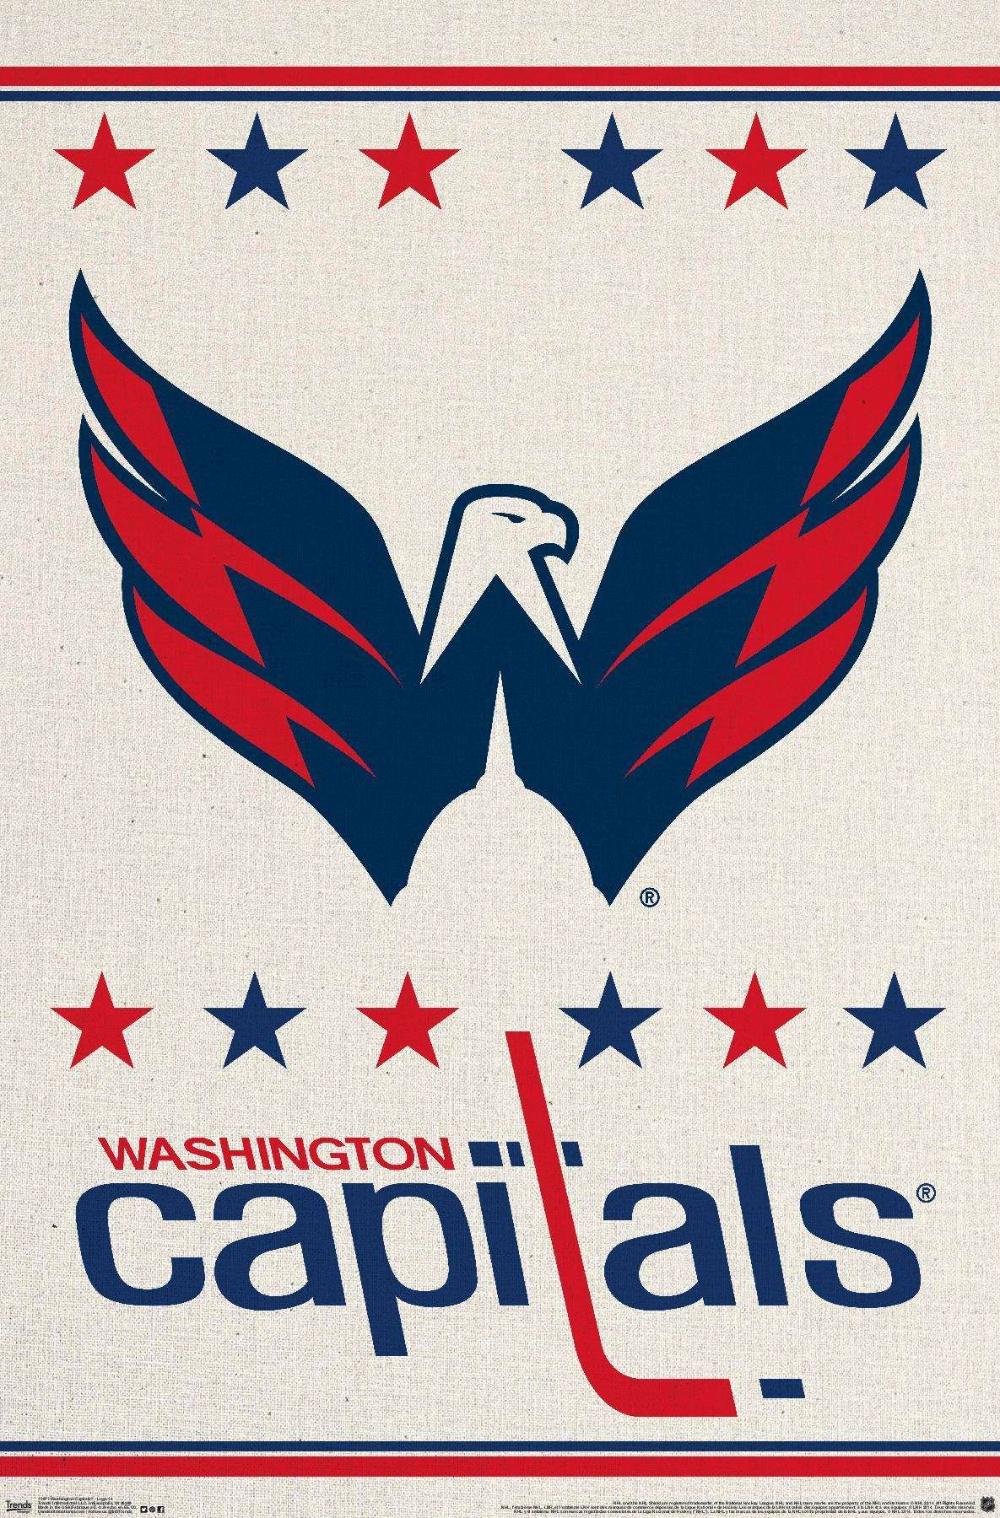 Nhl Washington Capitals Logo 14 Washington Capitals Logo Washington Capitals Nhl Washington Capitals